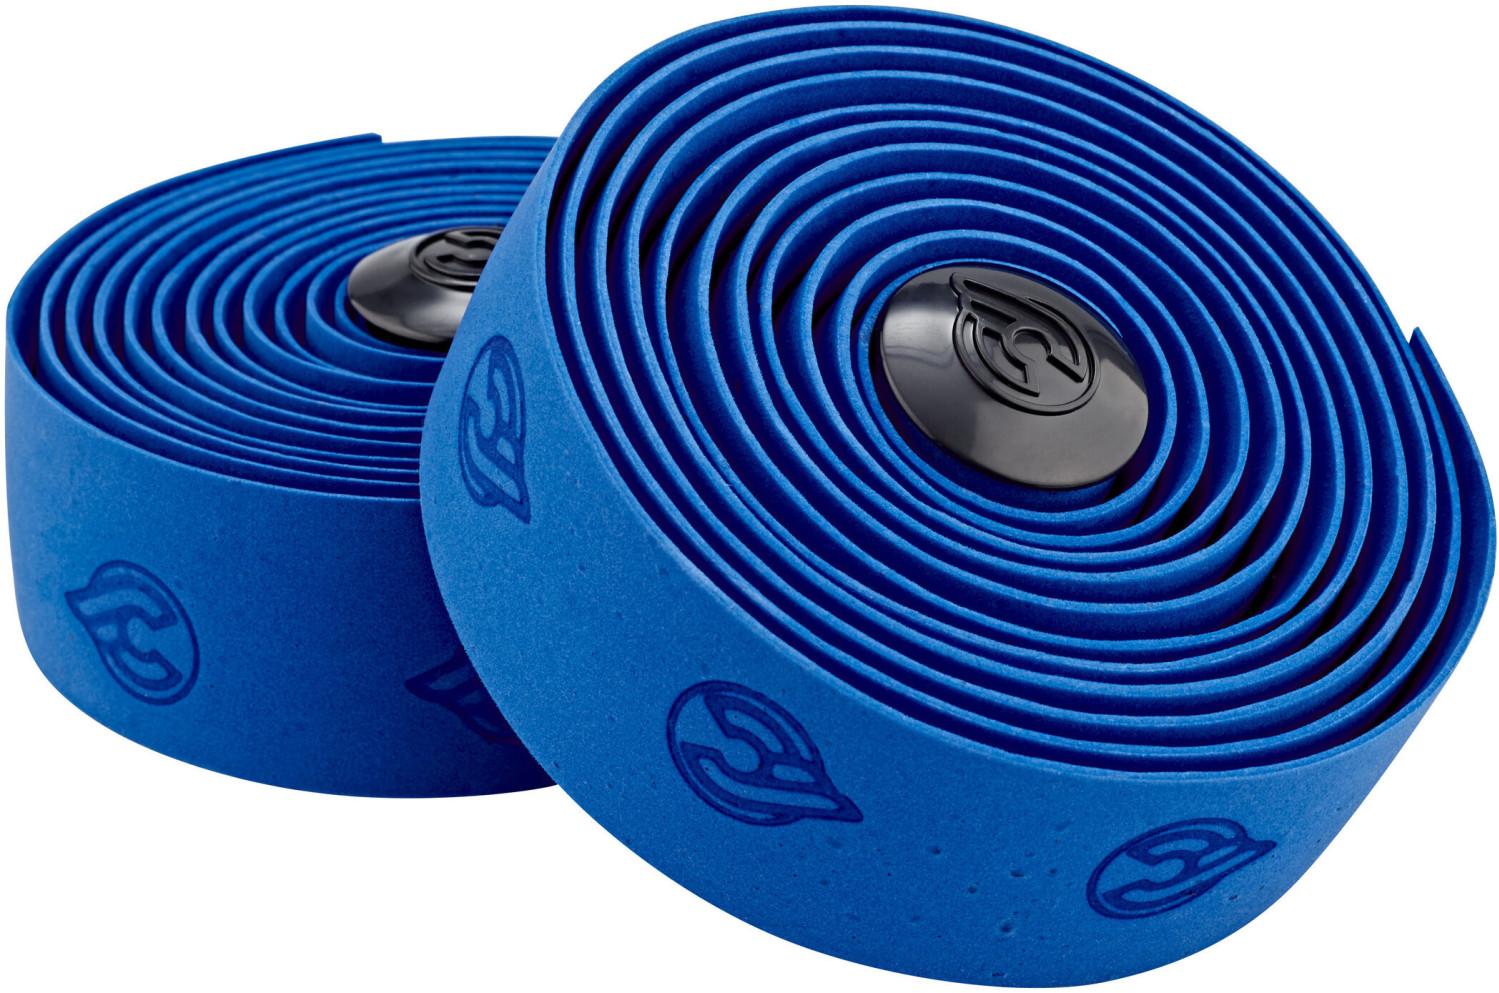 Cinelli Gel Lenkerband blue